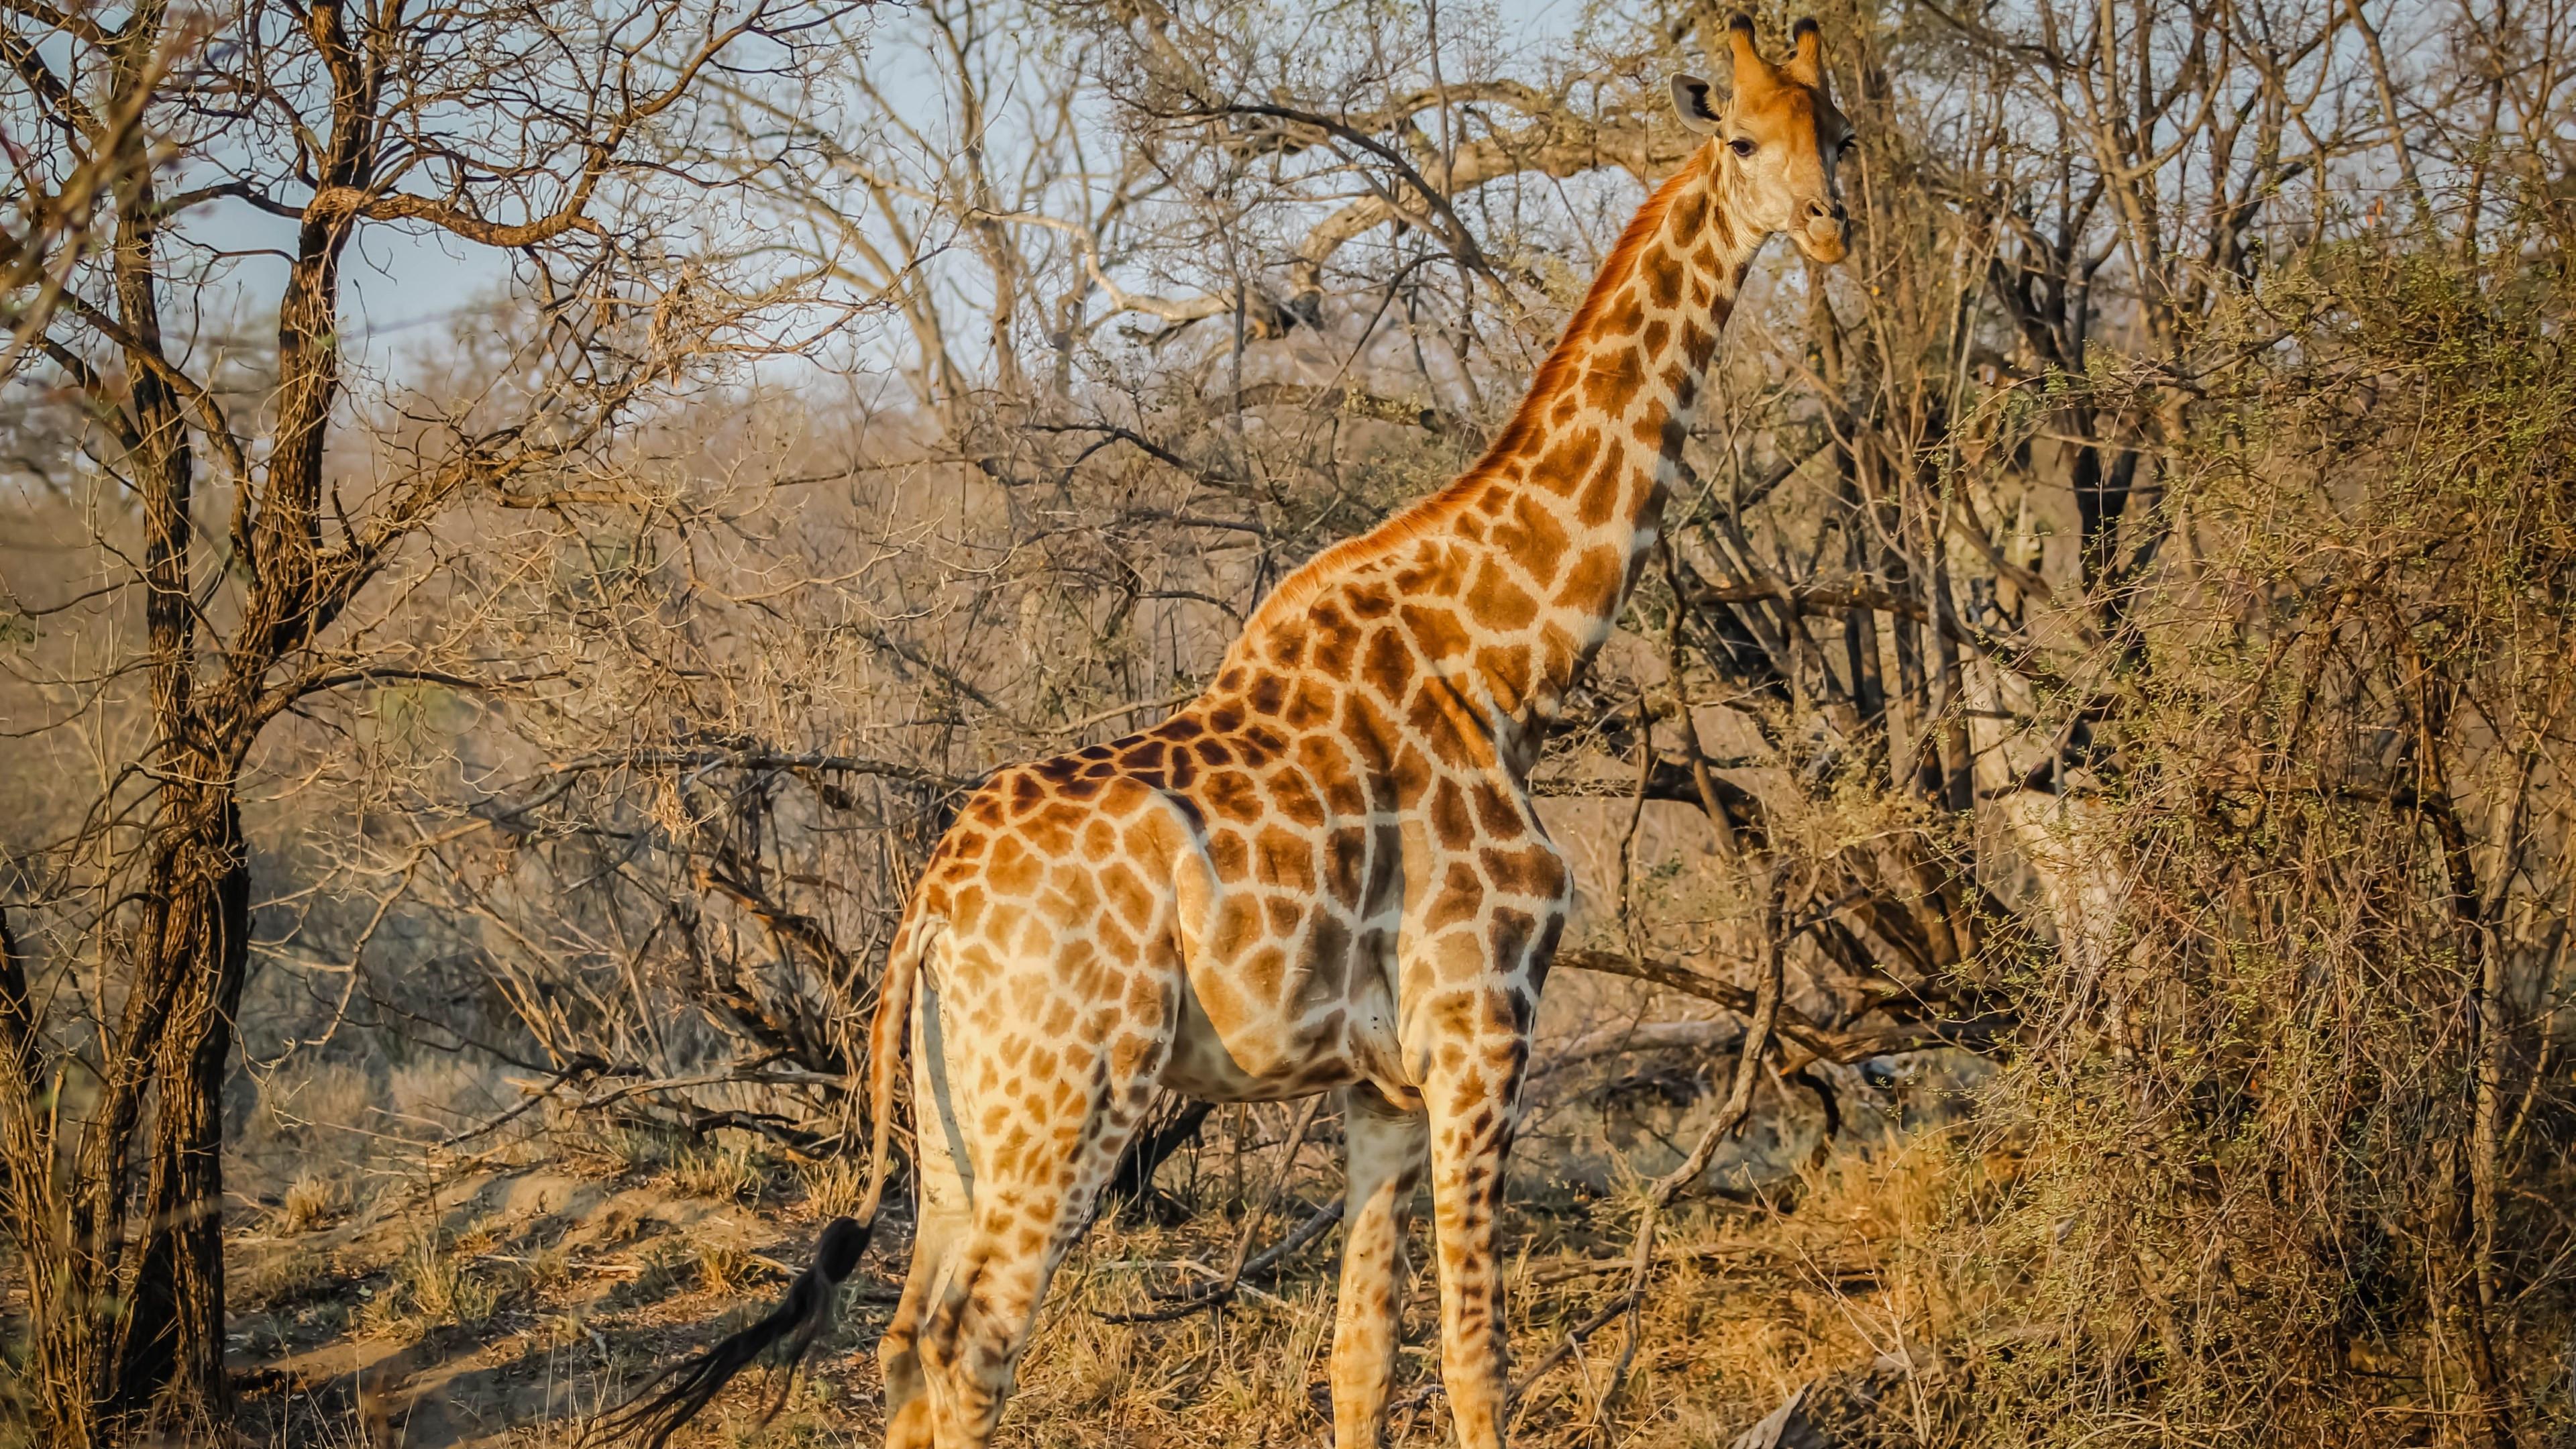 Ultra Hd Desktop Wallpapers Download Wallpaper Wild Giraffe In African Safari 3840x2160